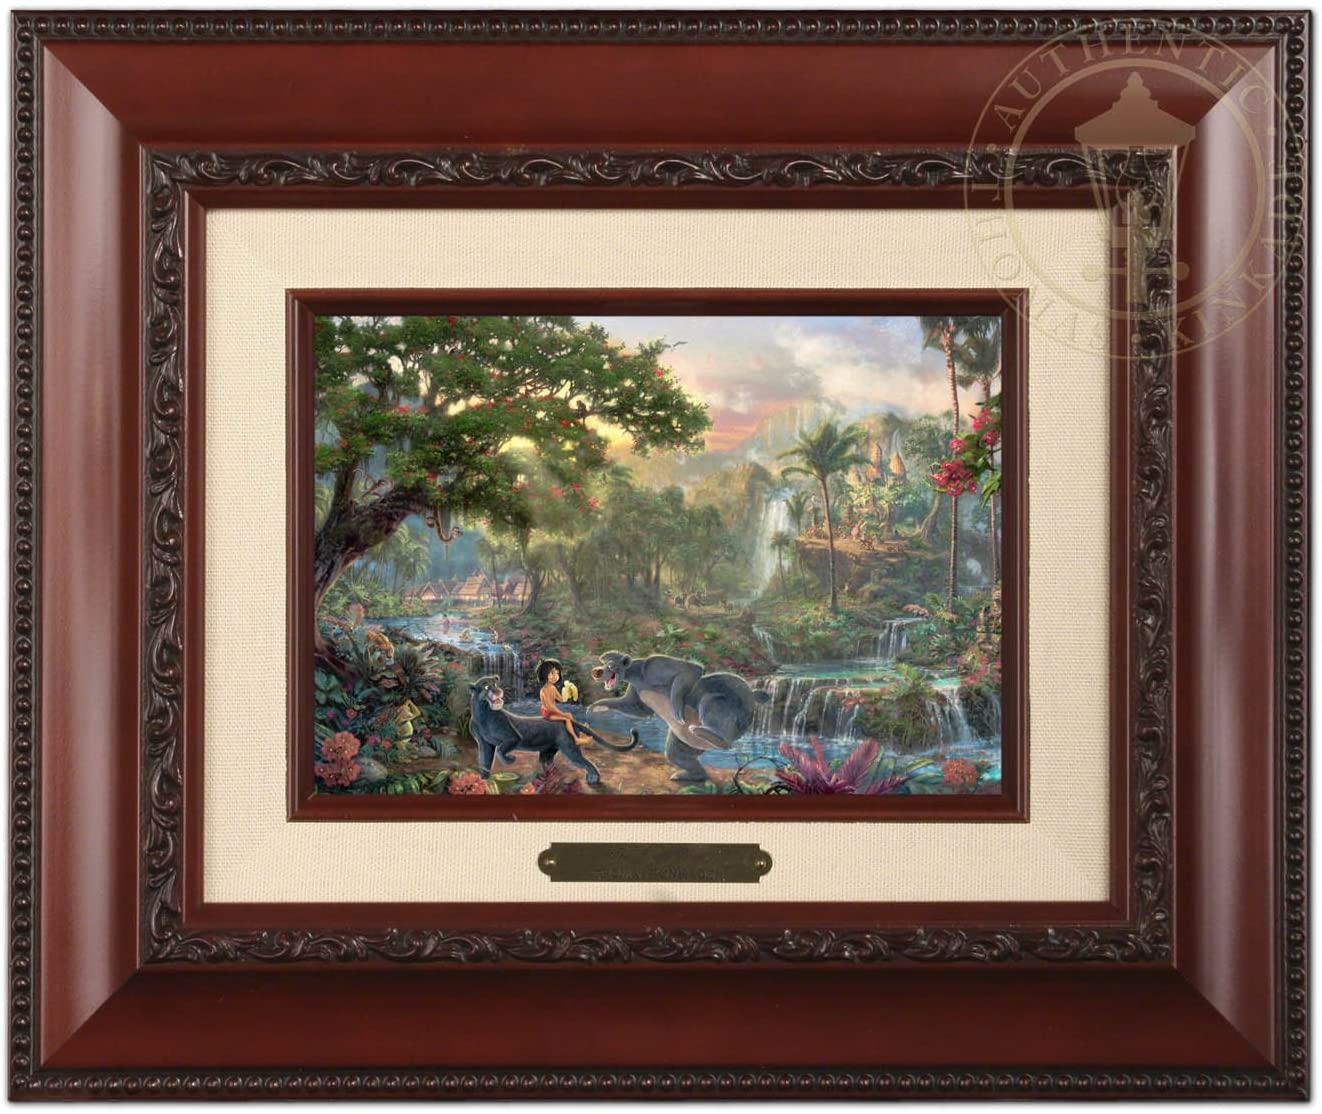 Thomas Kinkade Disney The Jungle Book Brushwork (Brandy Frame)